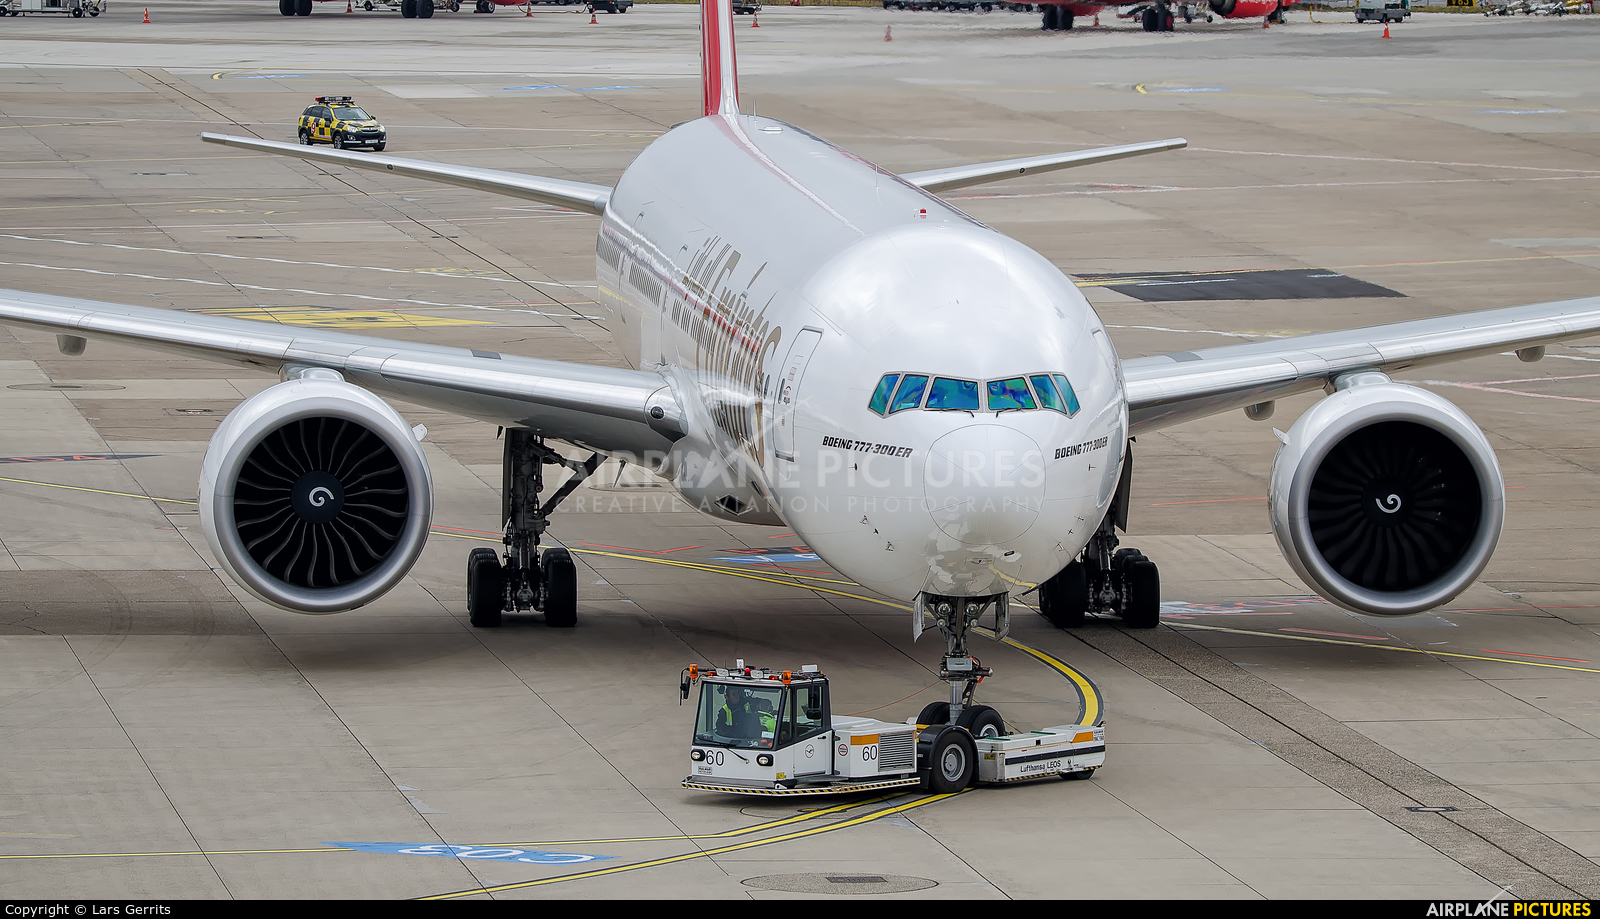 Emirates Airlines A6-ENN aircraft at Düsseldorf